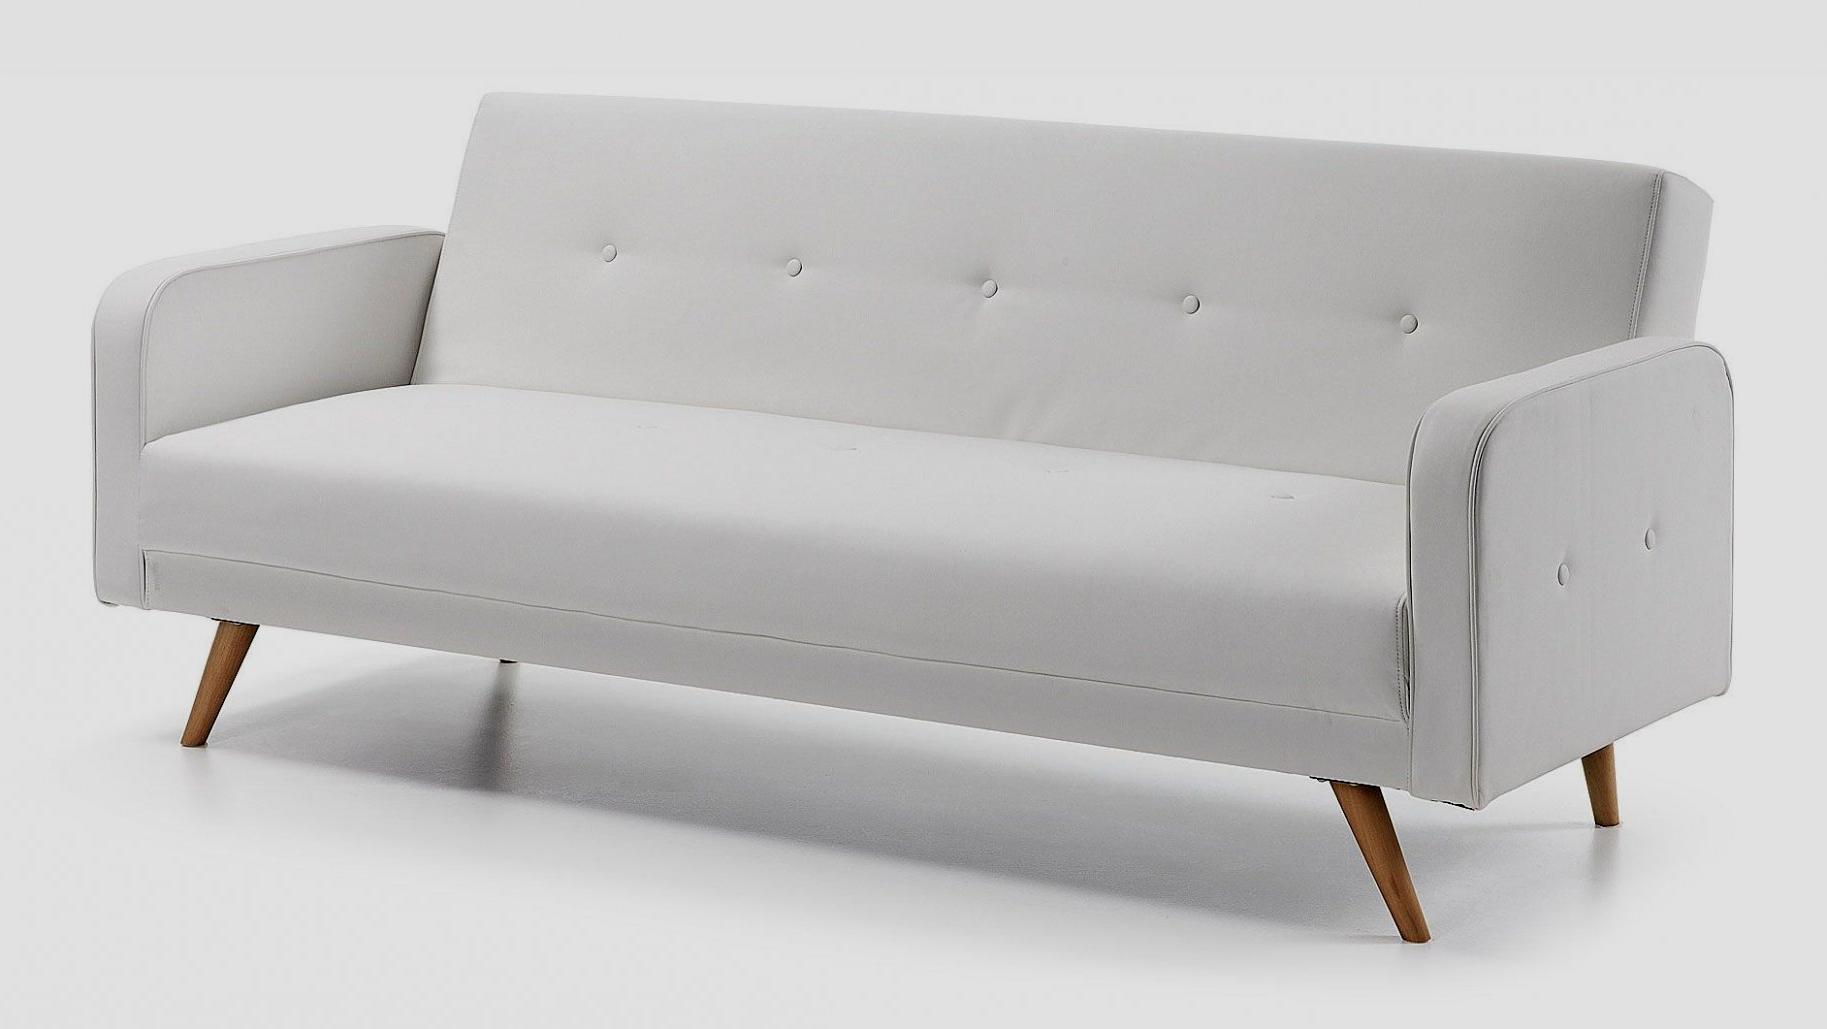 Sofa Cama Blanco Tldn sofa Blanco Magnifico Retro Schlafsofa Inspirierend sofÃ